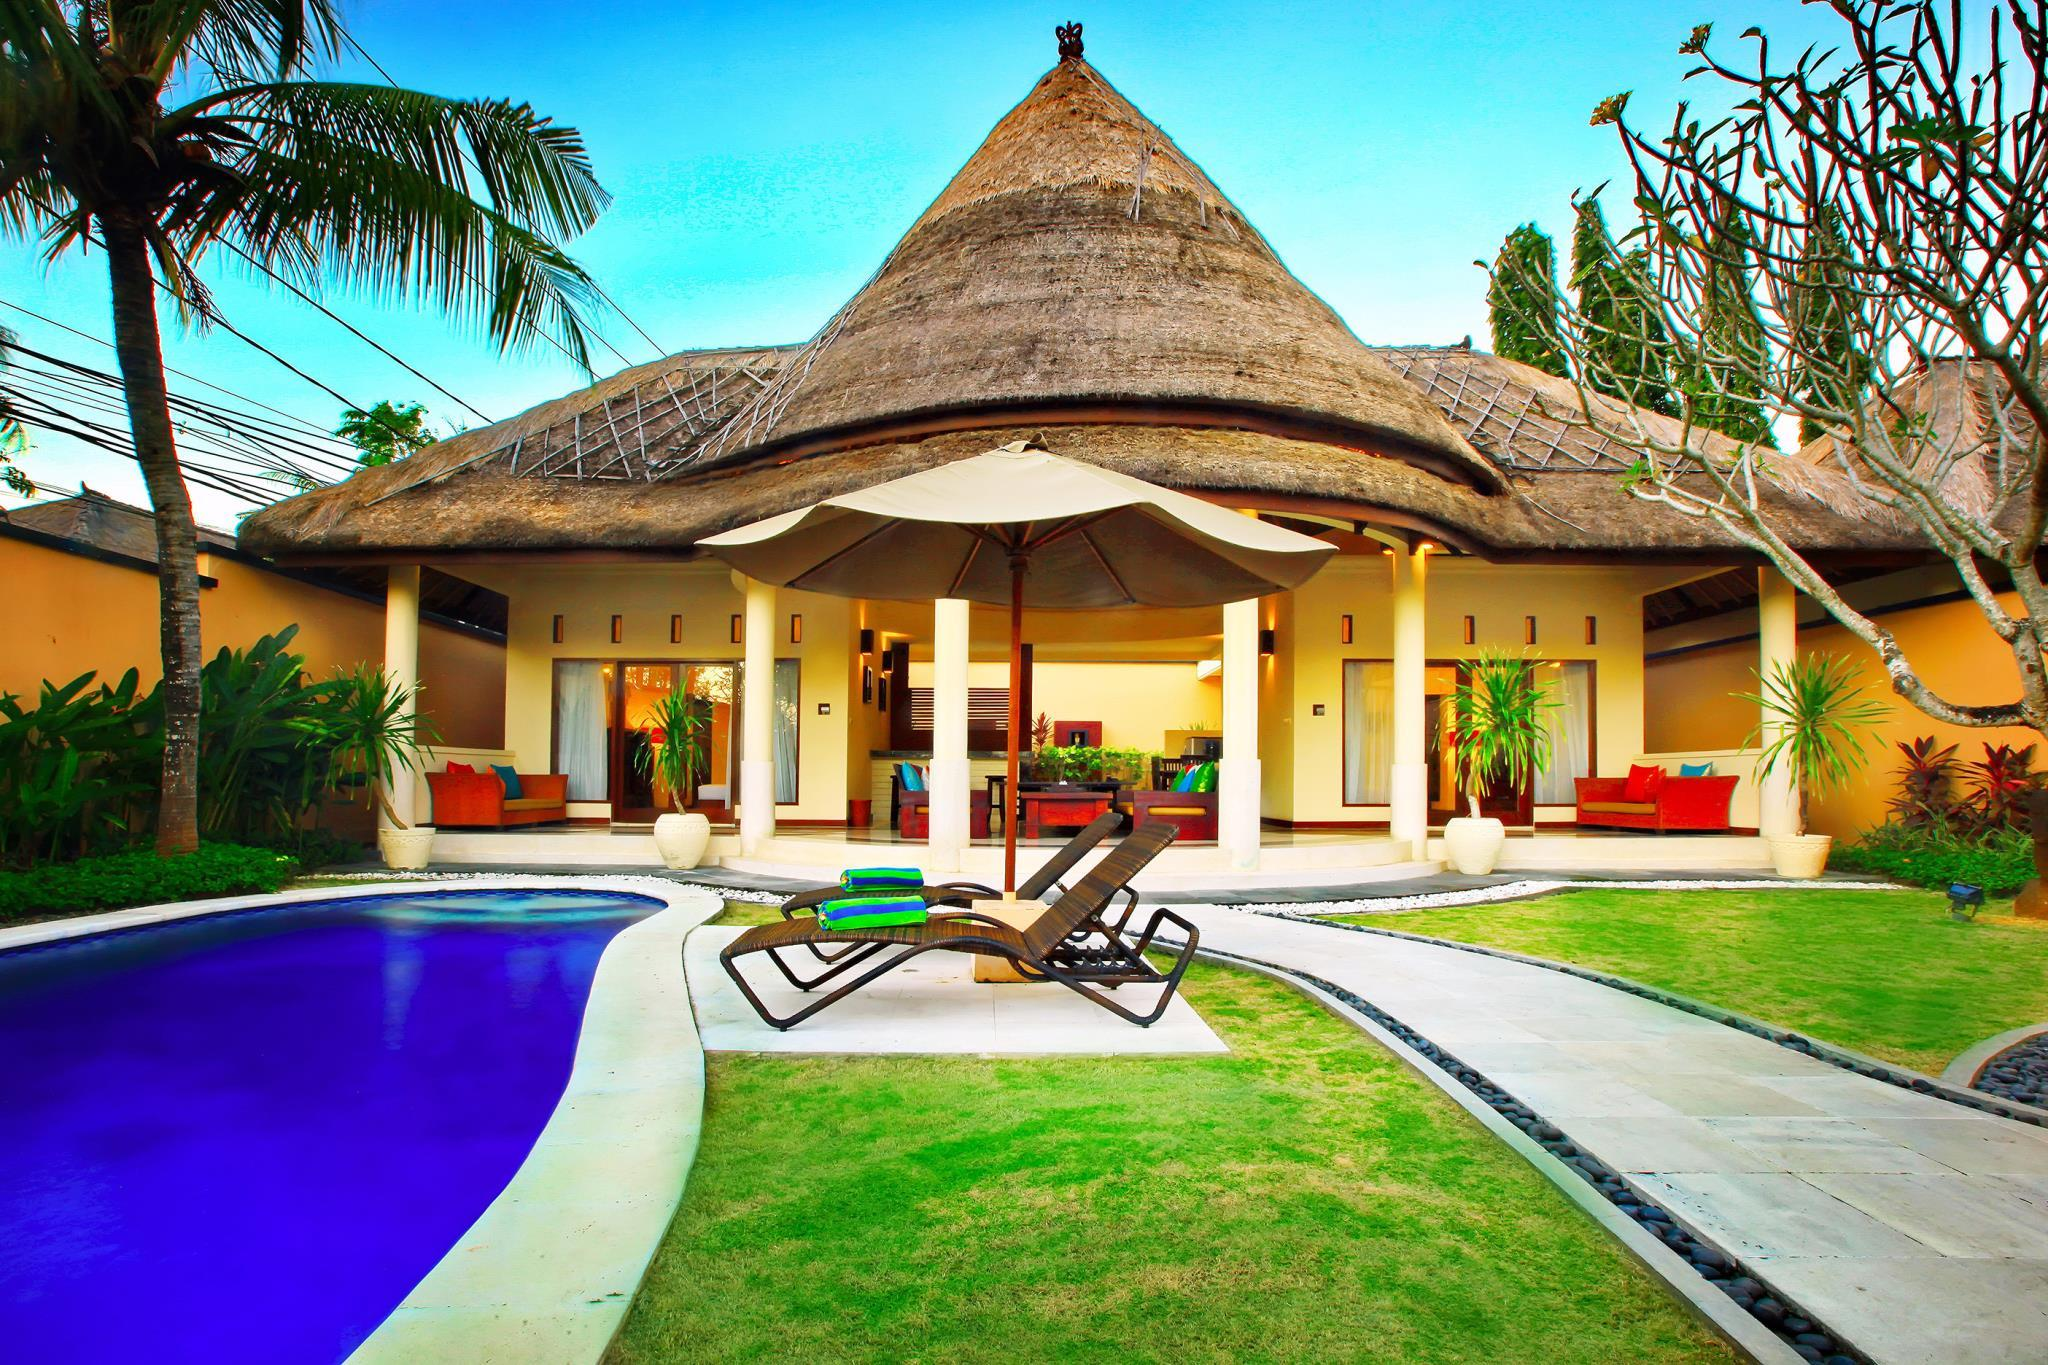 The Mutiara Jimbaran Boutique Villas